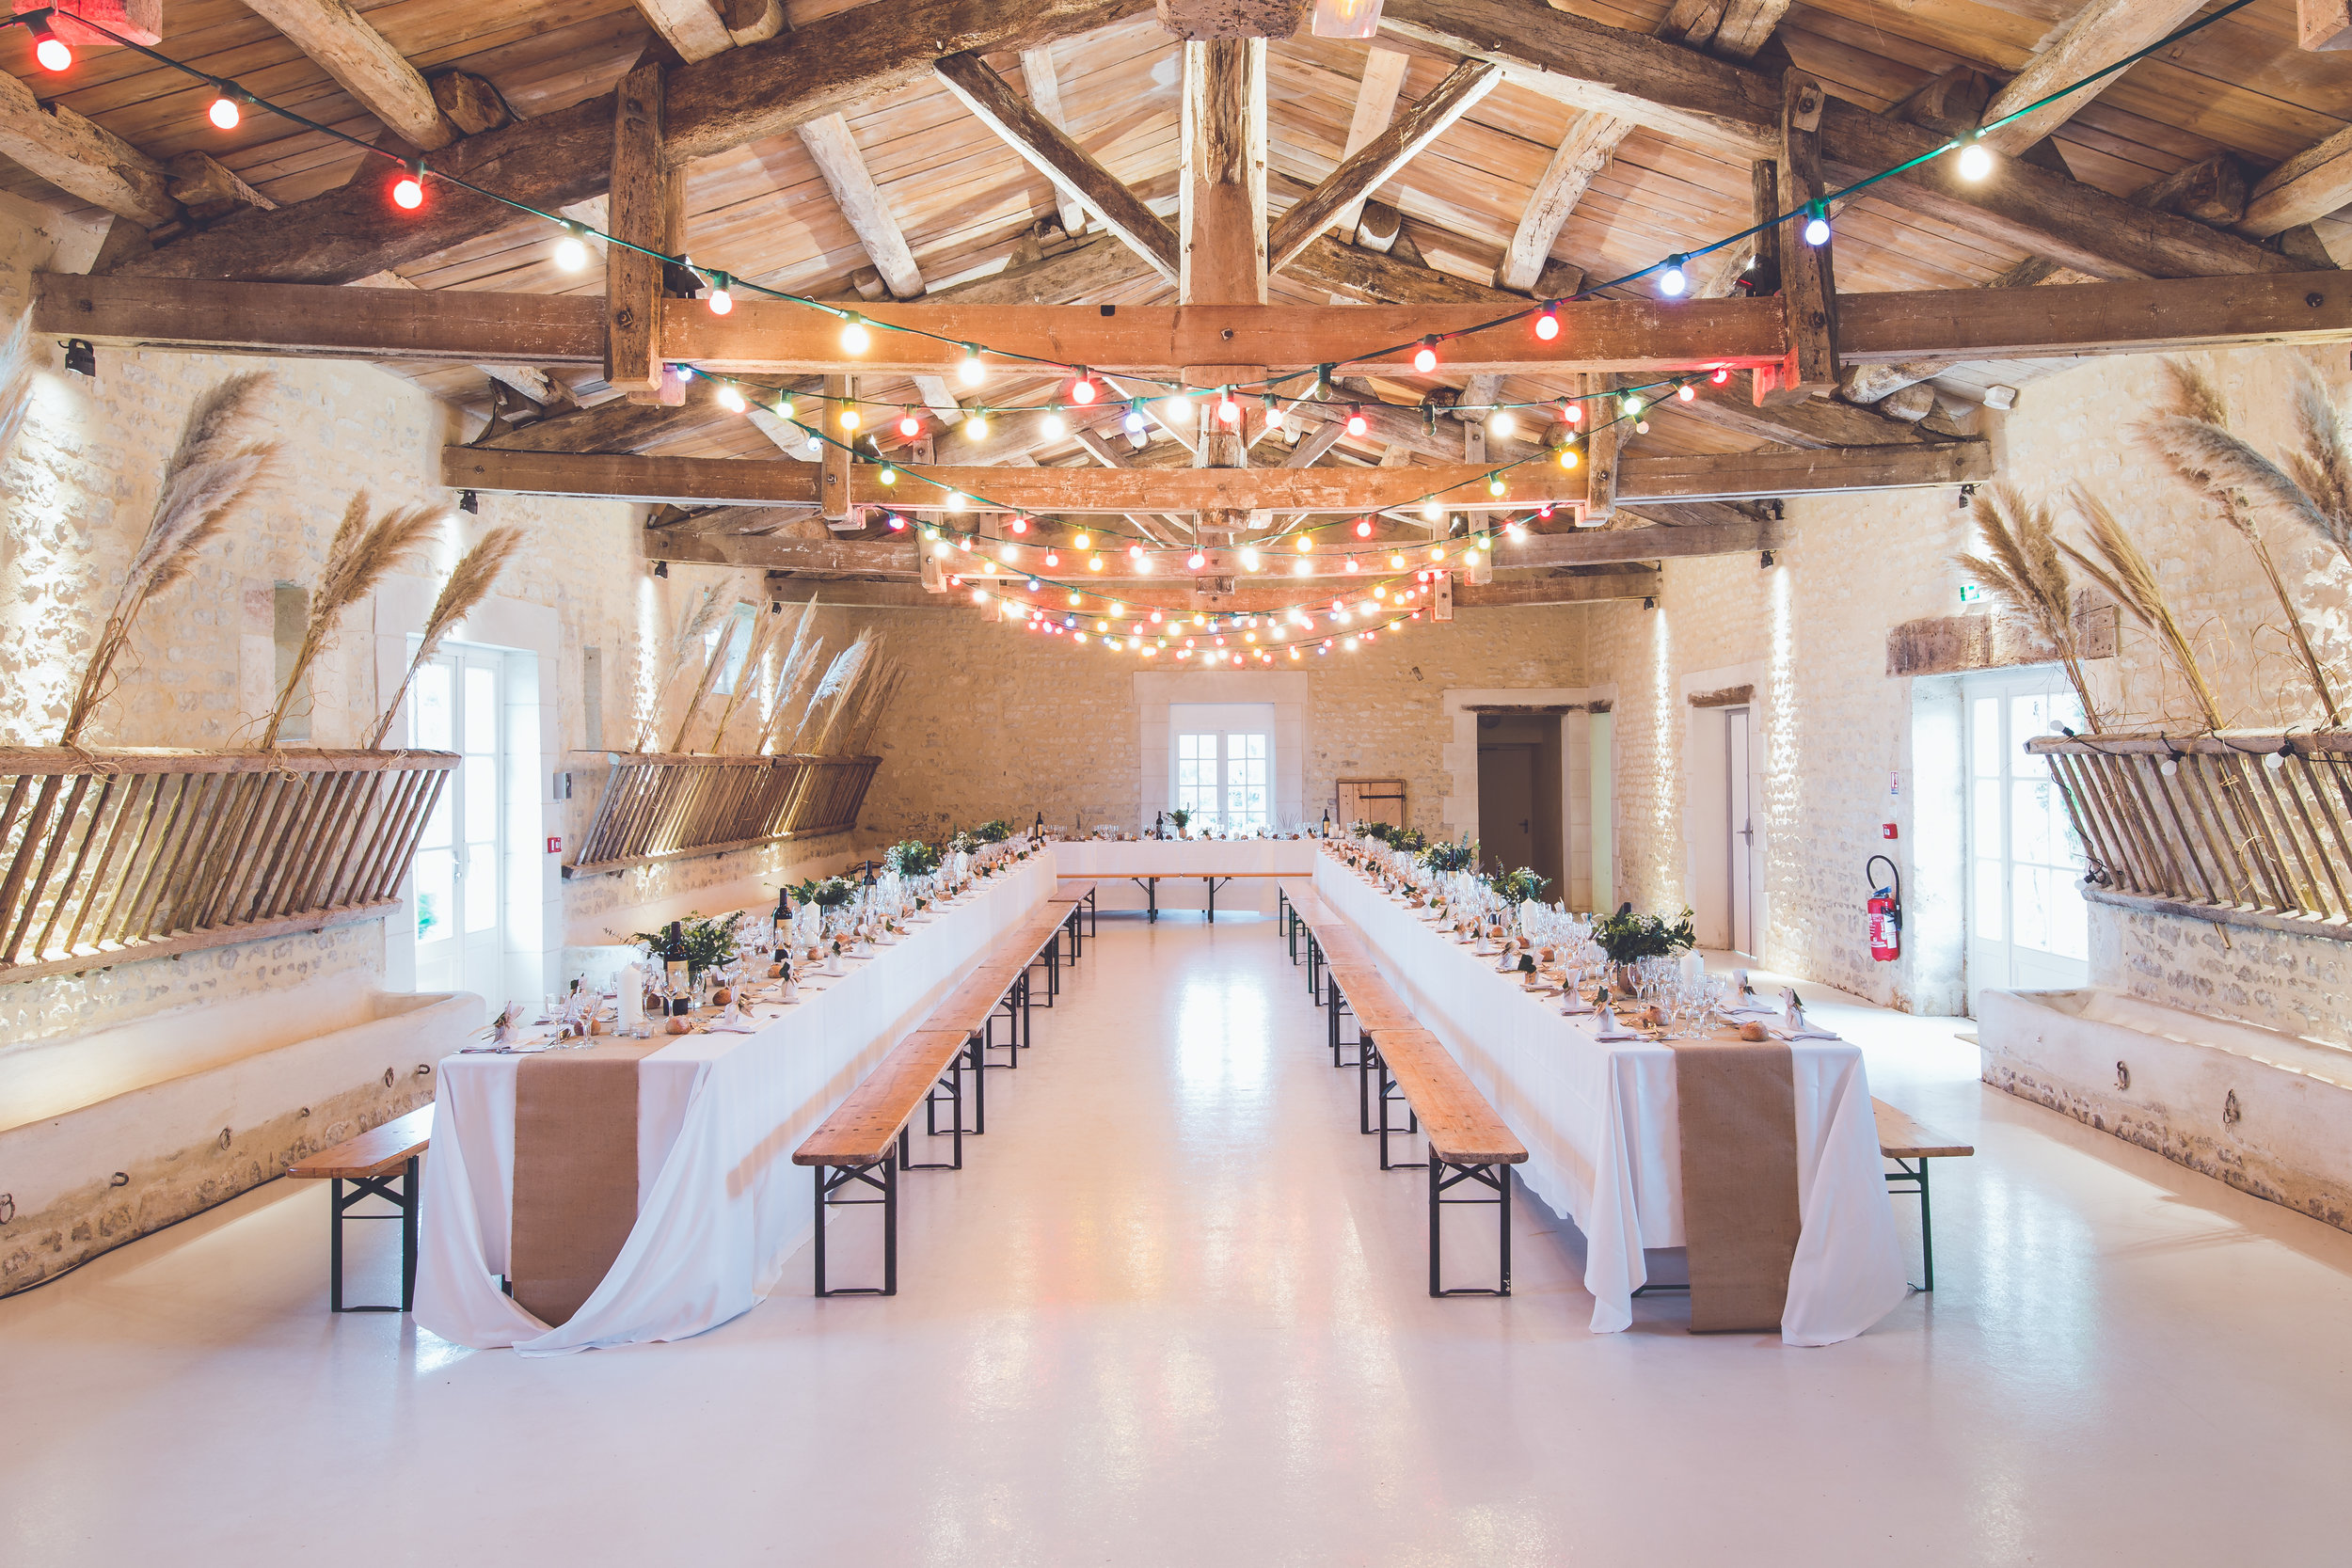 Lovely Parties - Bridal Showers - Baby Showers - Christening - CommunionsAnniversaries - Weddings